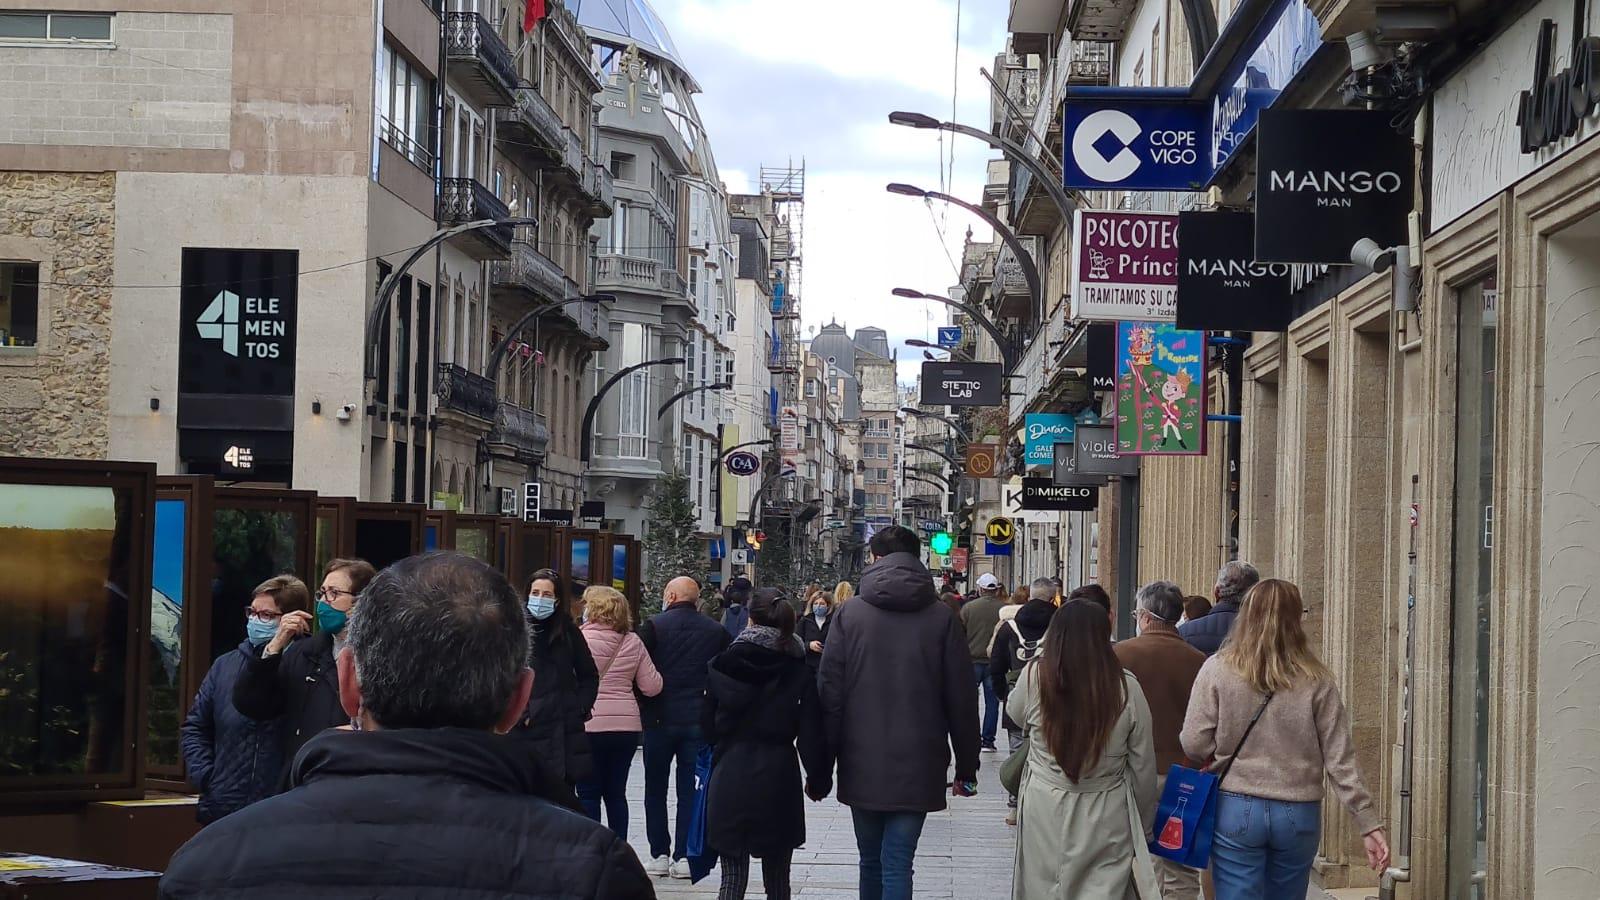 Calle Príncipe, en el centro de Vigo, sábado 6 de febrero 2021/vigoalminuto